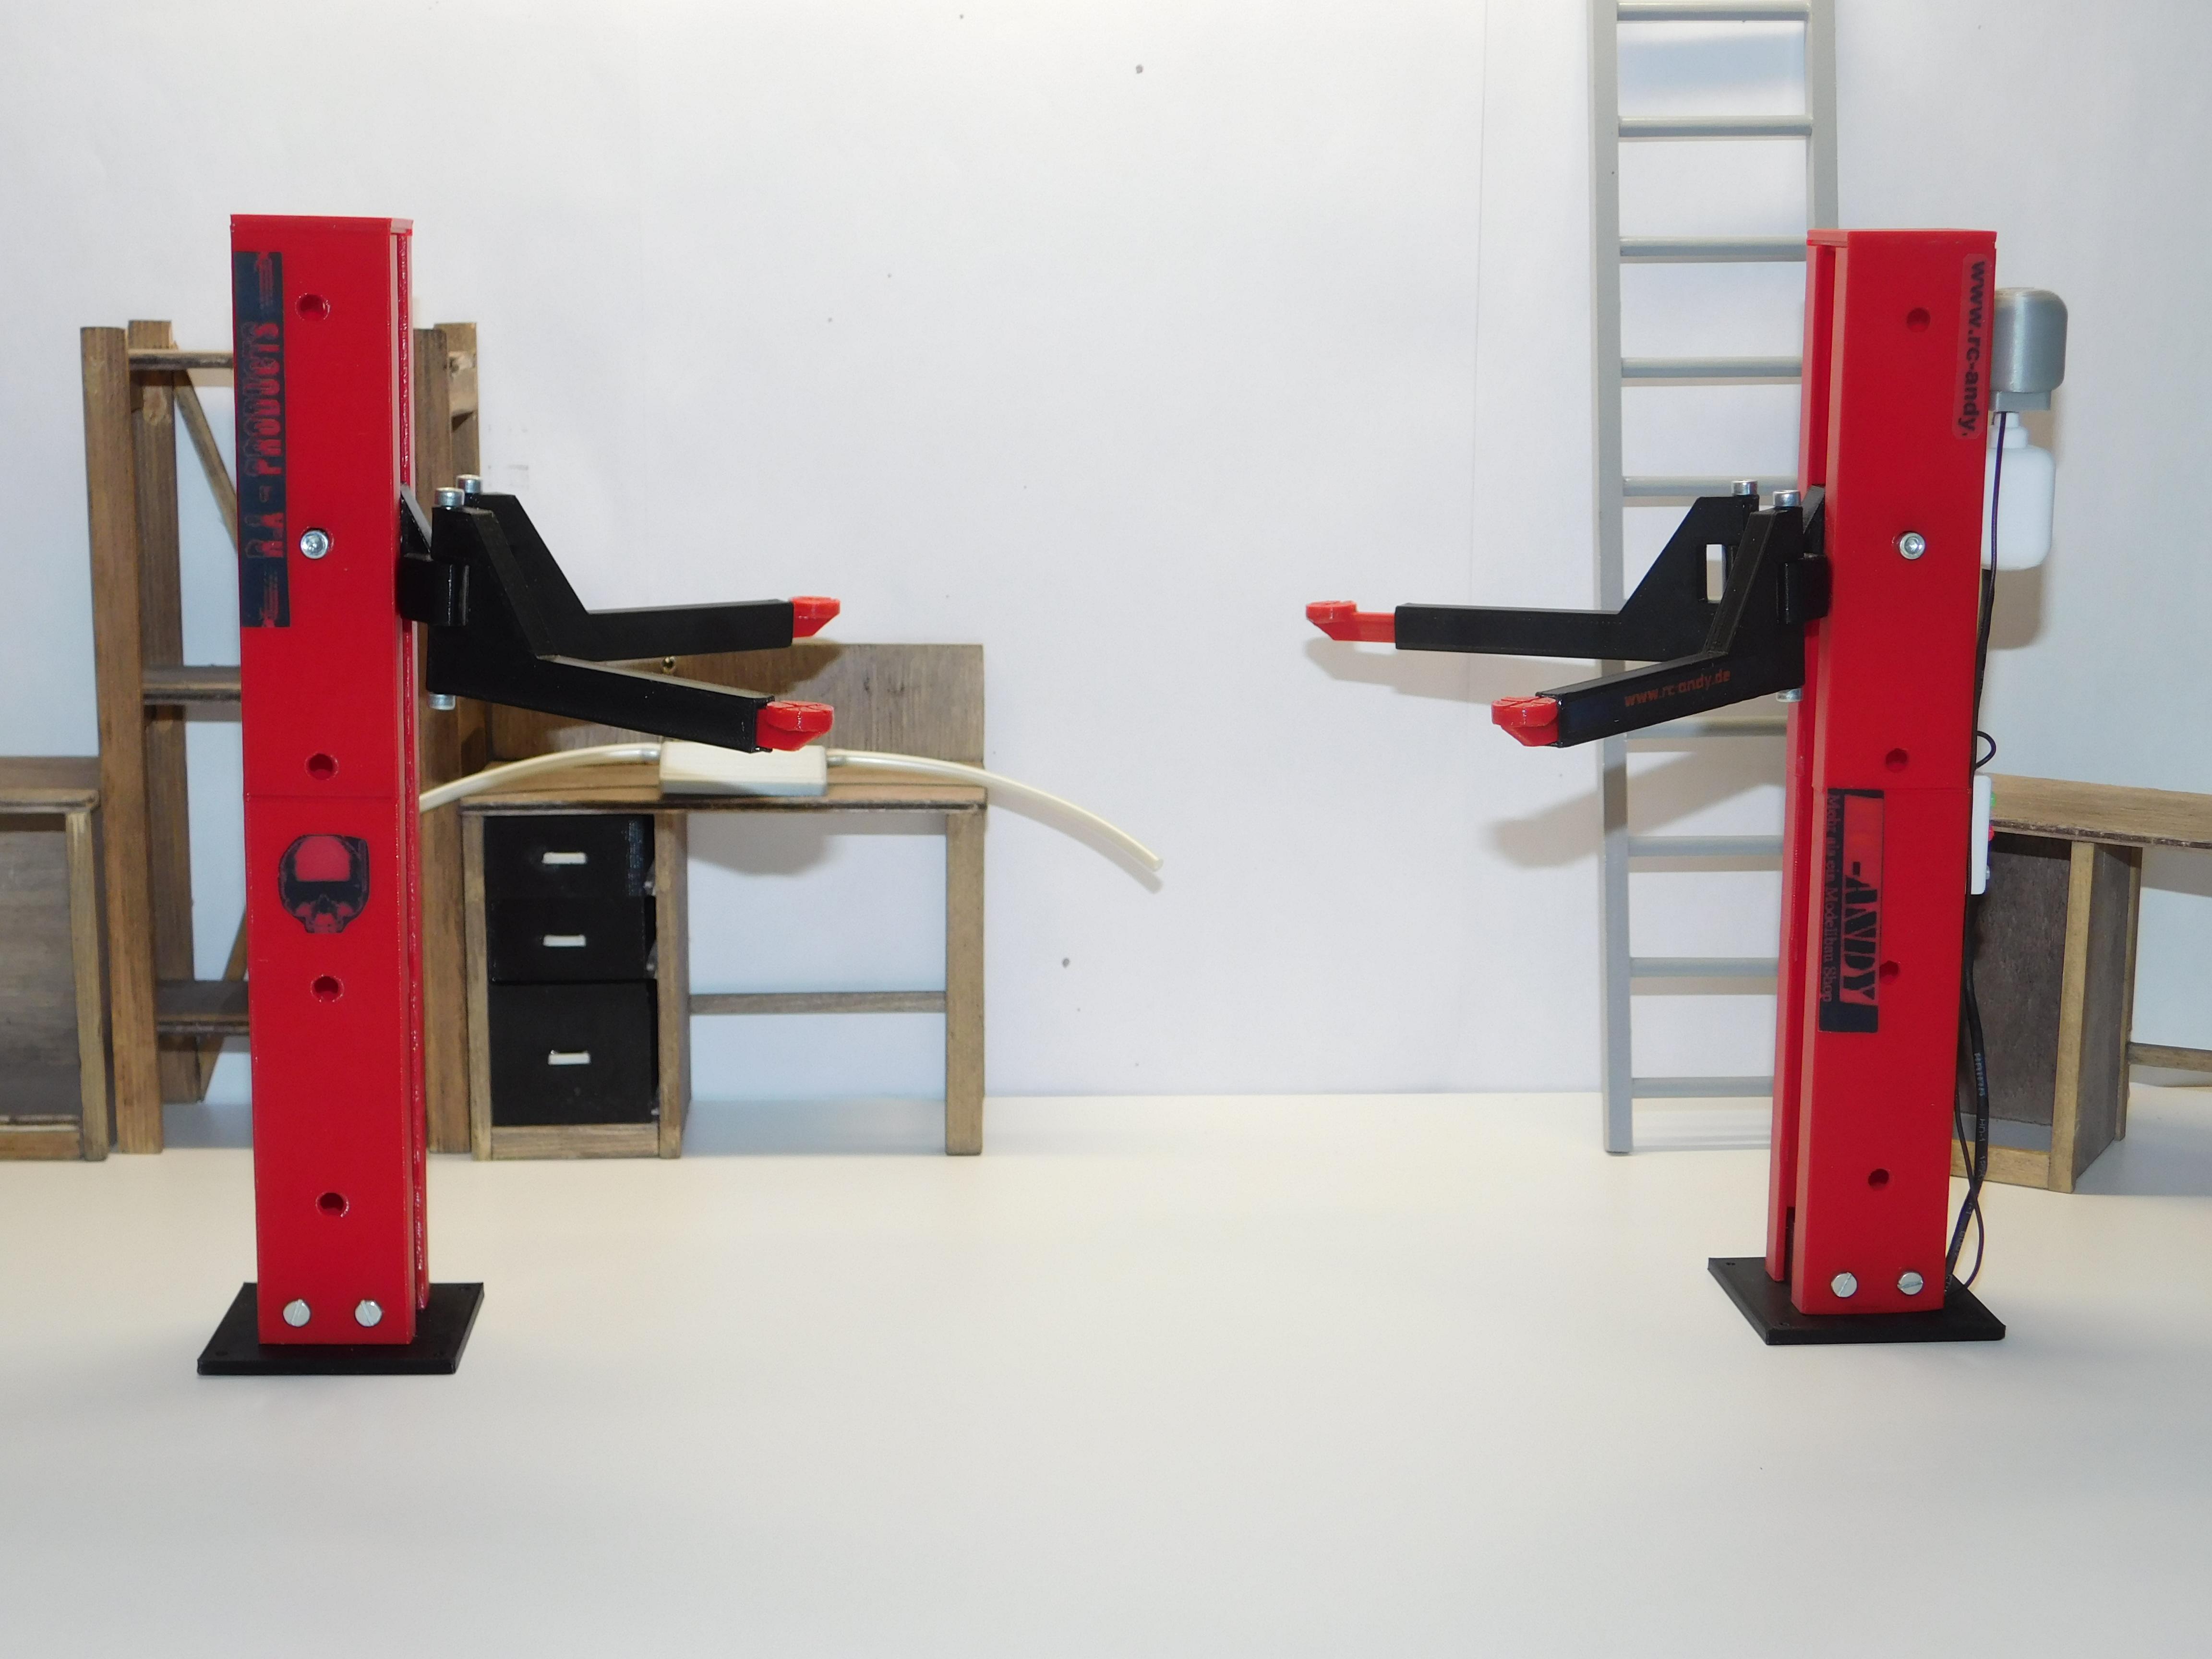 r a products 2 s ulen hebeb hne 1 10 mechanisch rc andy shop. Black Bedroom Furniture Sets. Home Design Ideas